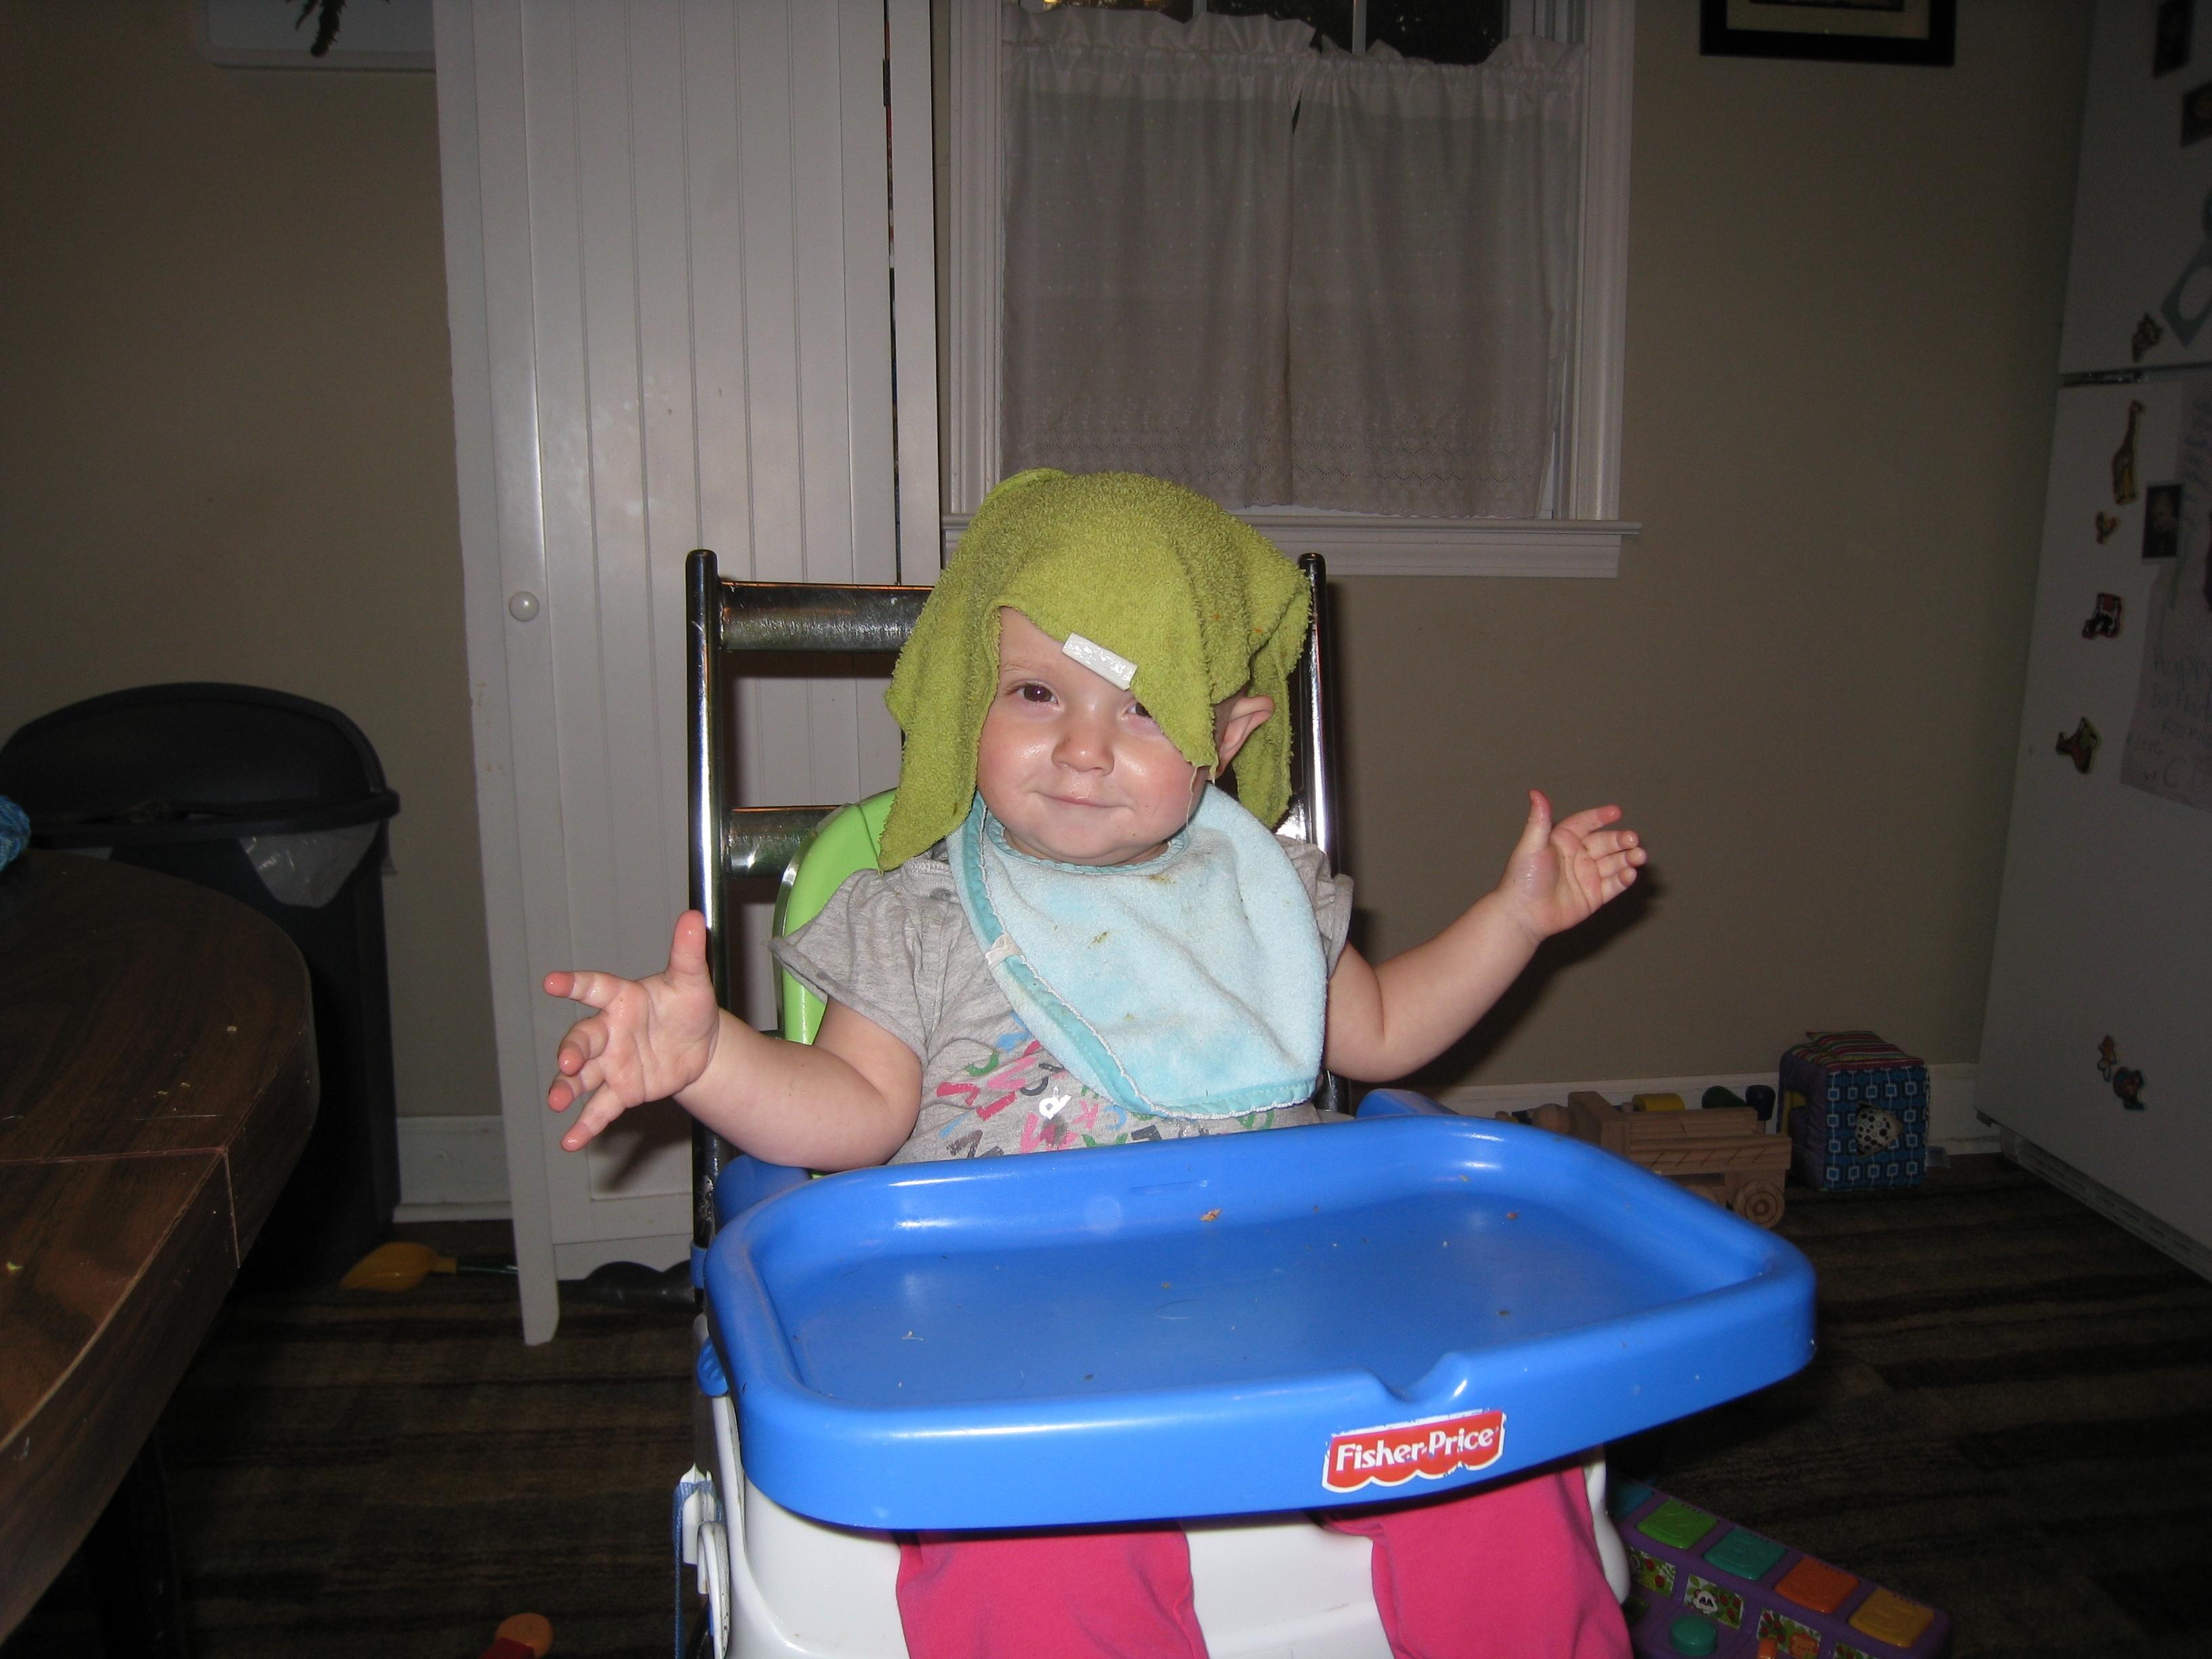 wet cloth on head